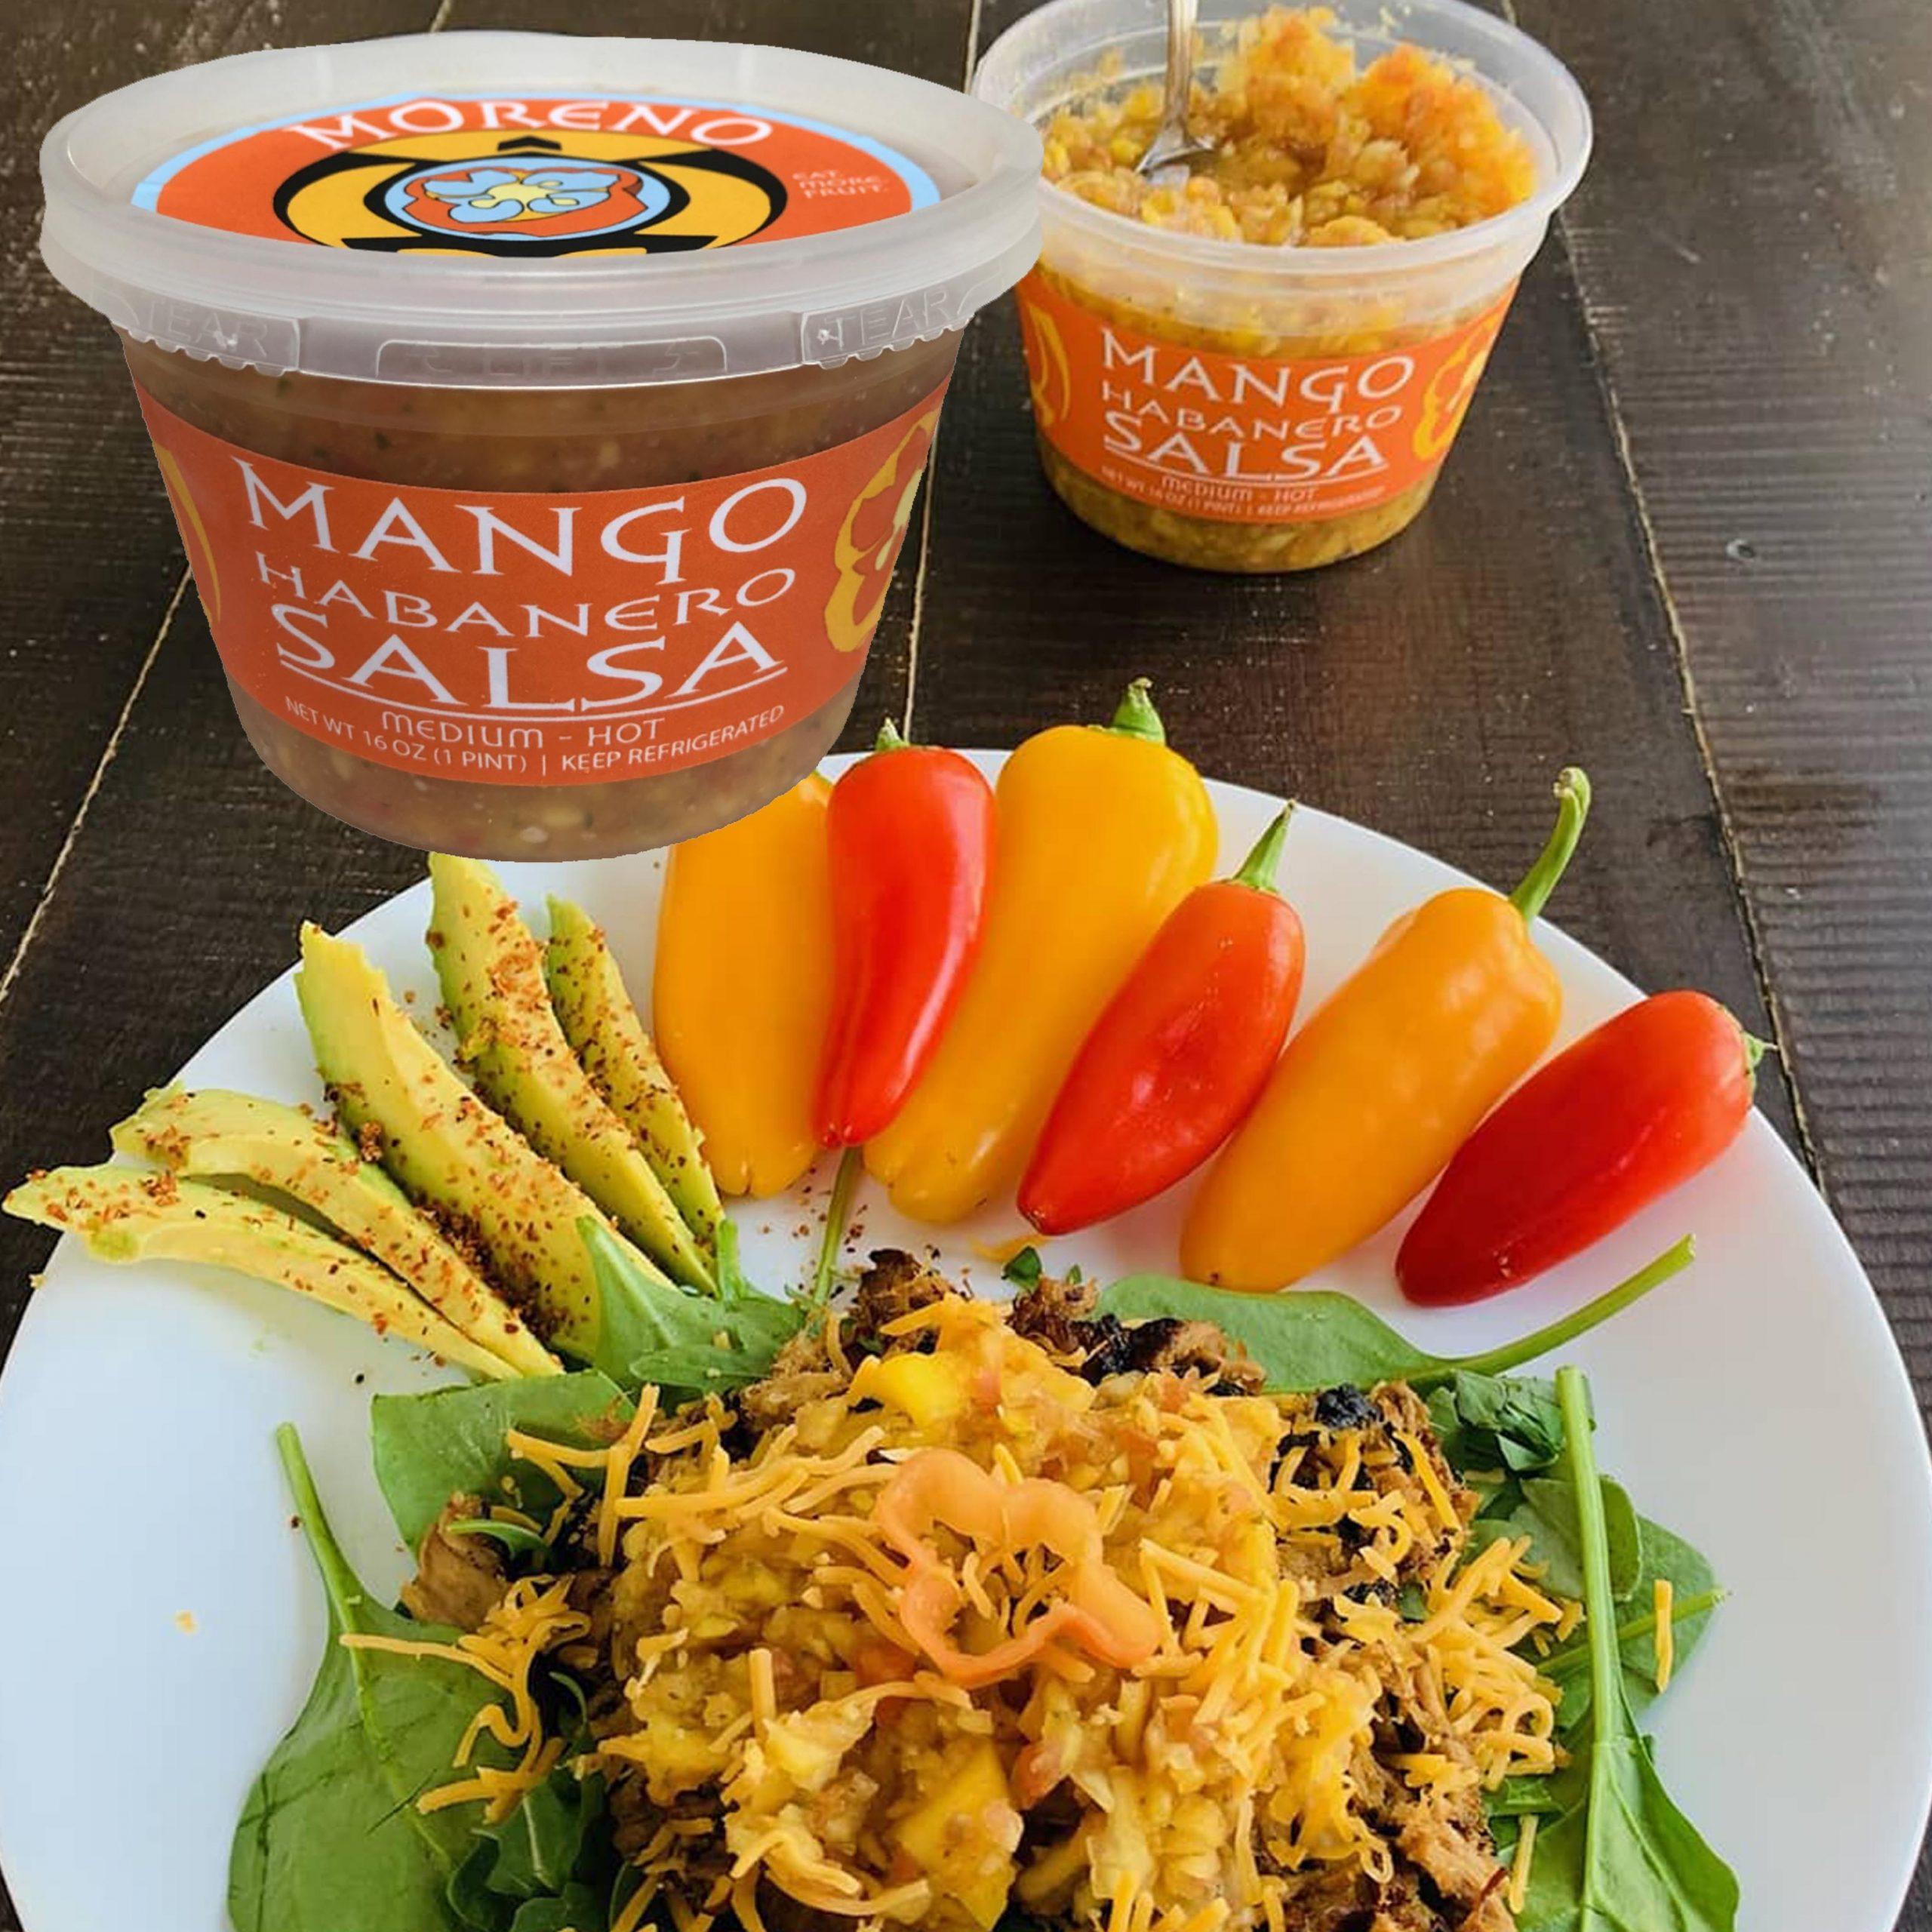 Mango Habanero Salsa Feature